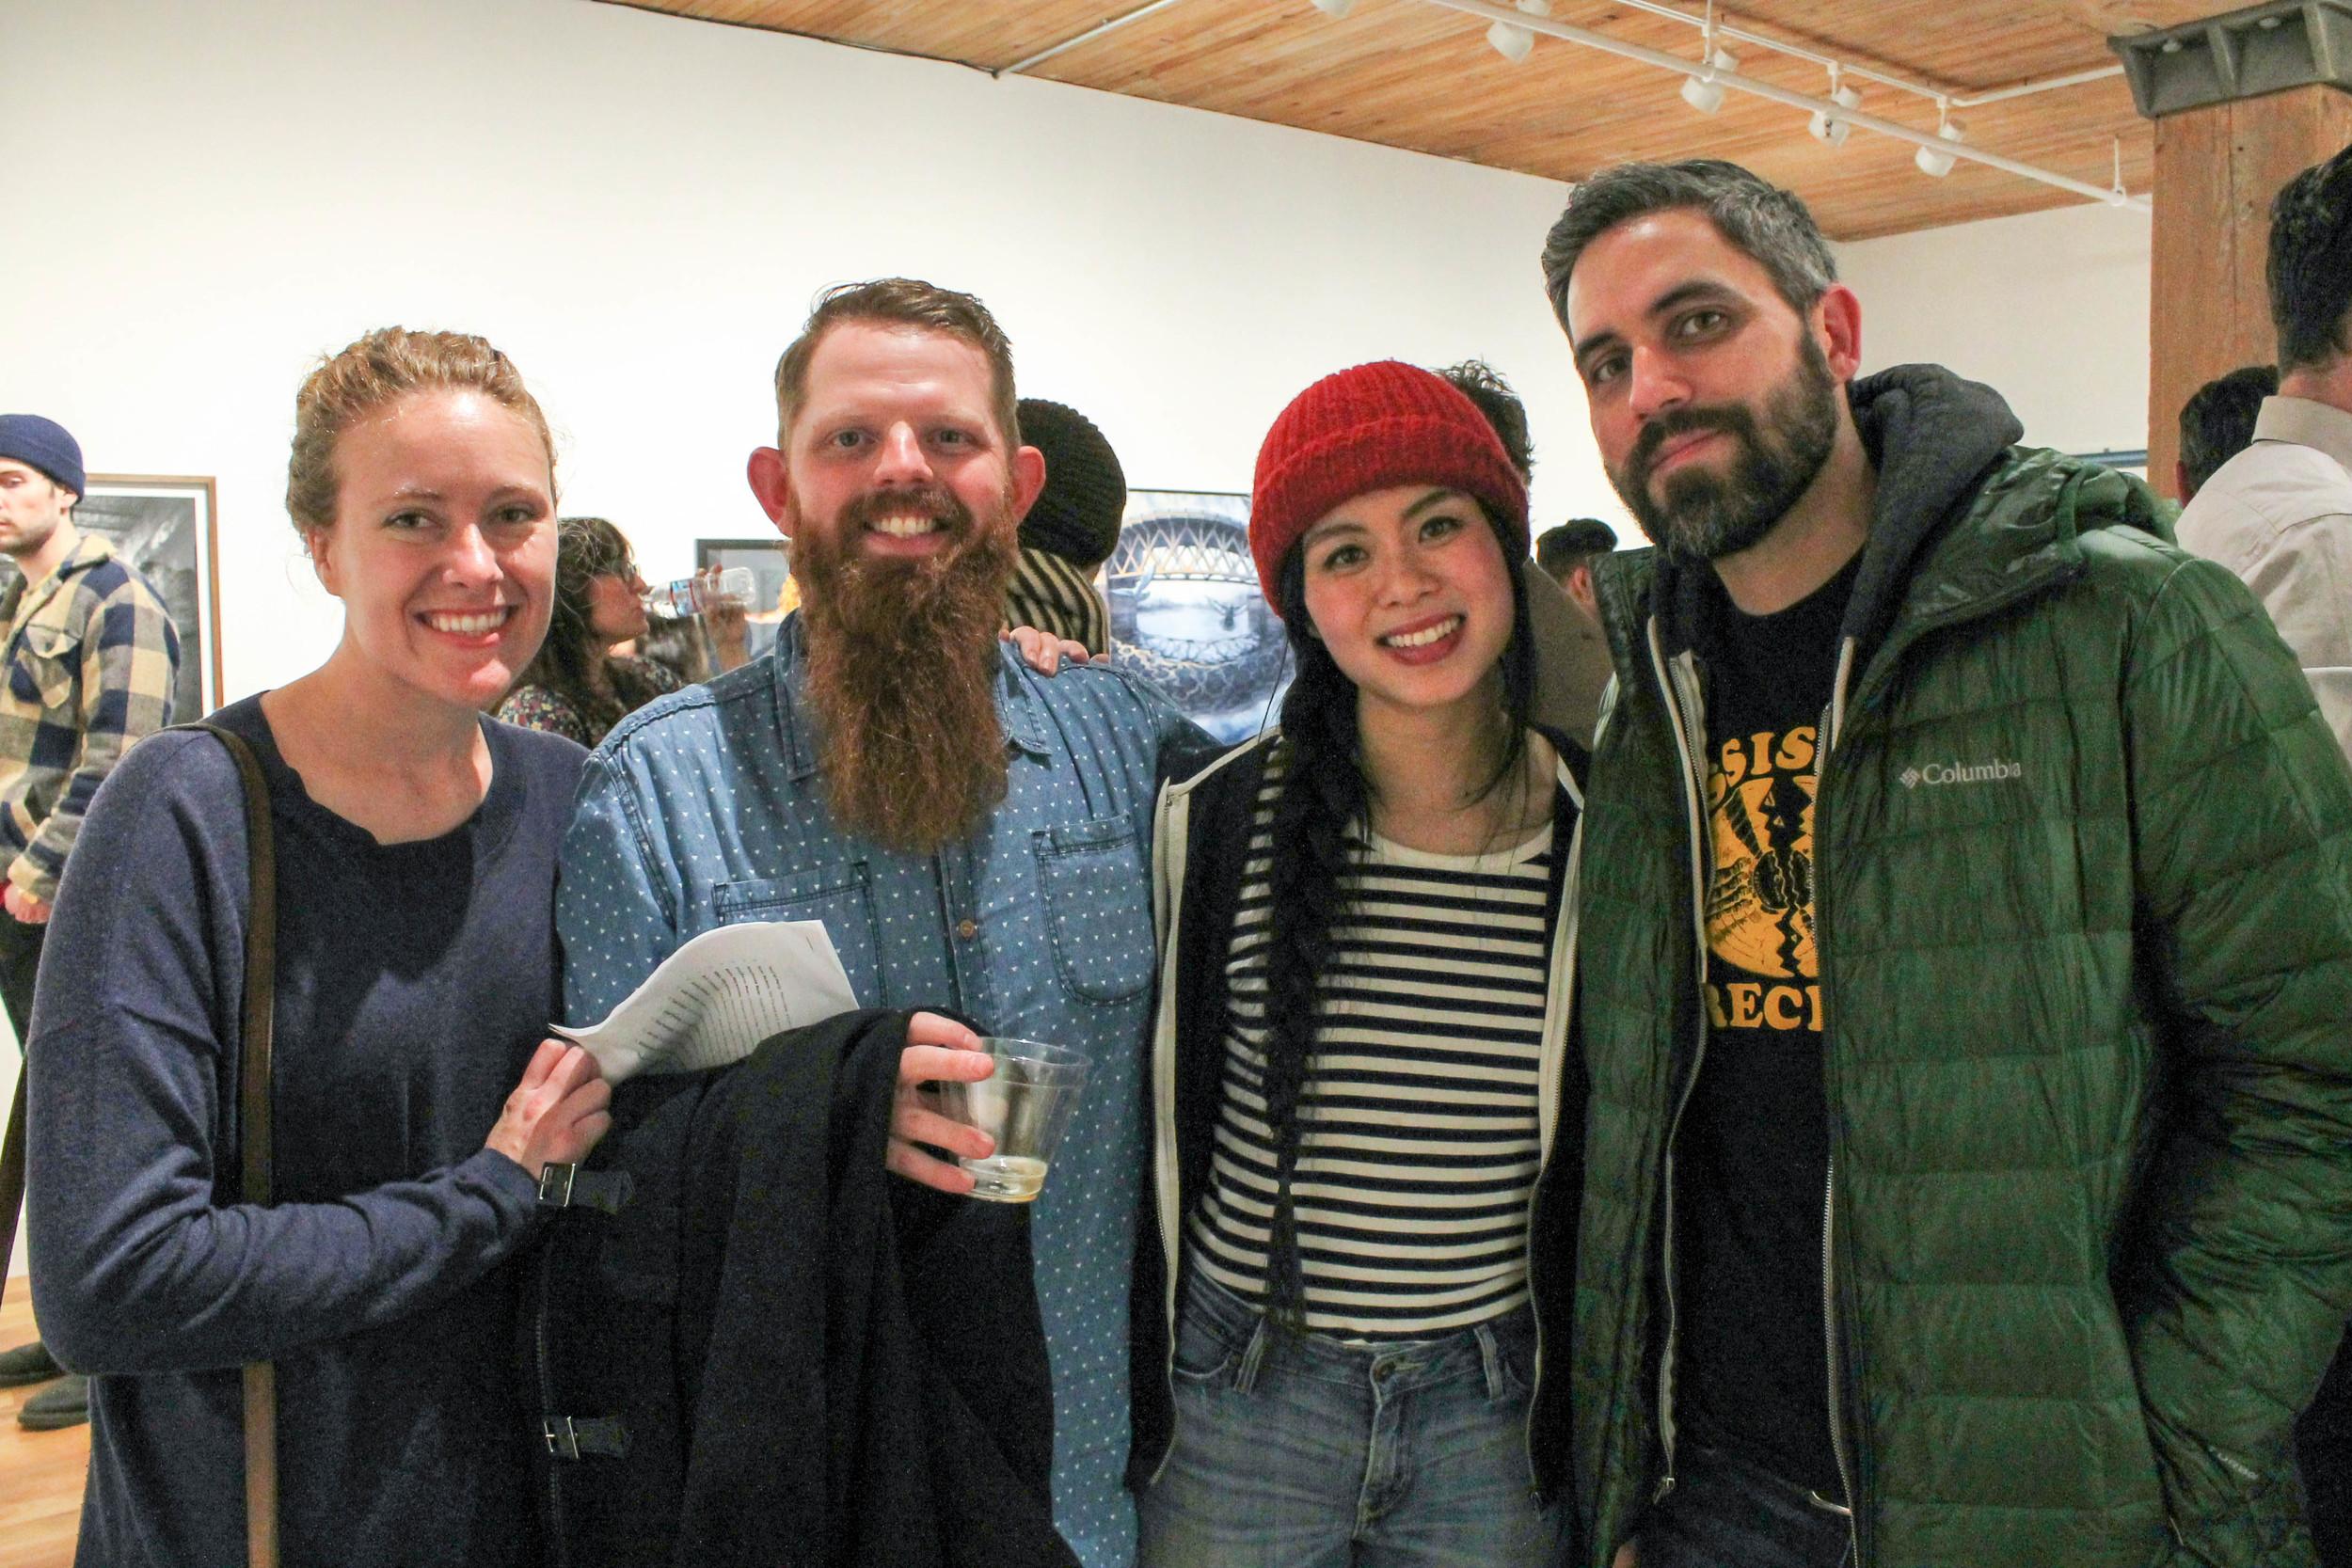 Susannah Kelly, Neil M. Perry, Monica Salazar, and Souther Salazar